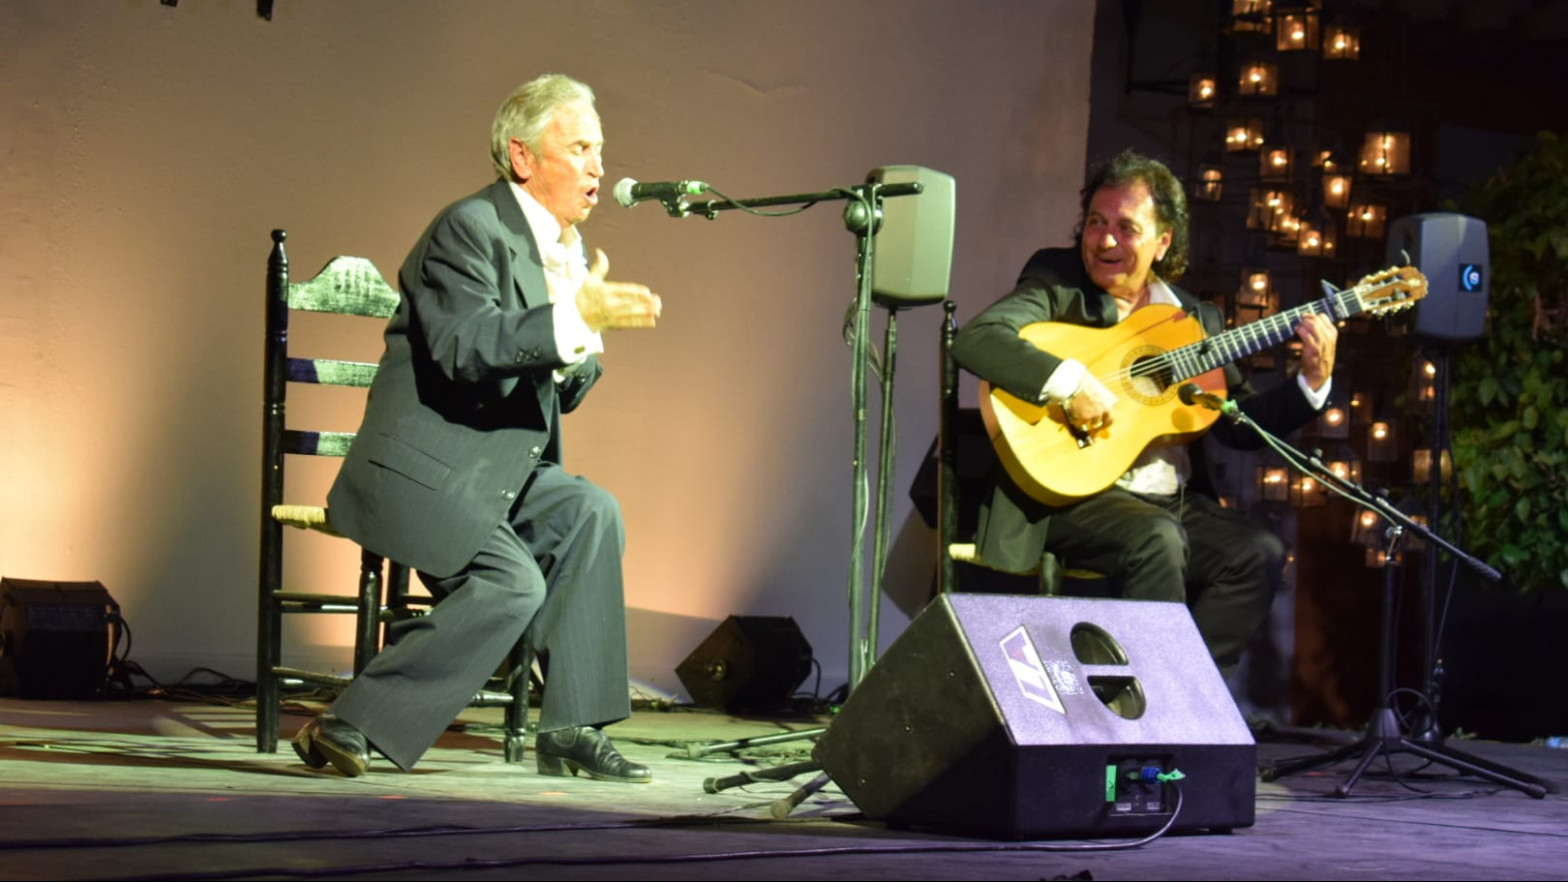 Una noche con Diego Clavel, ermitaño del cante